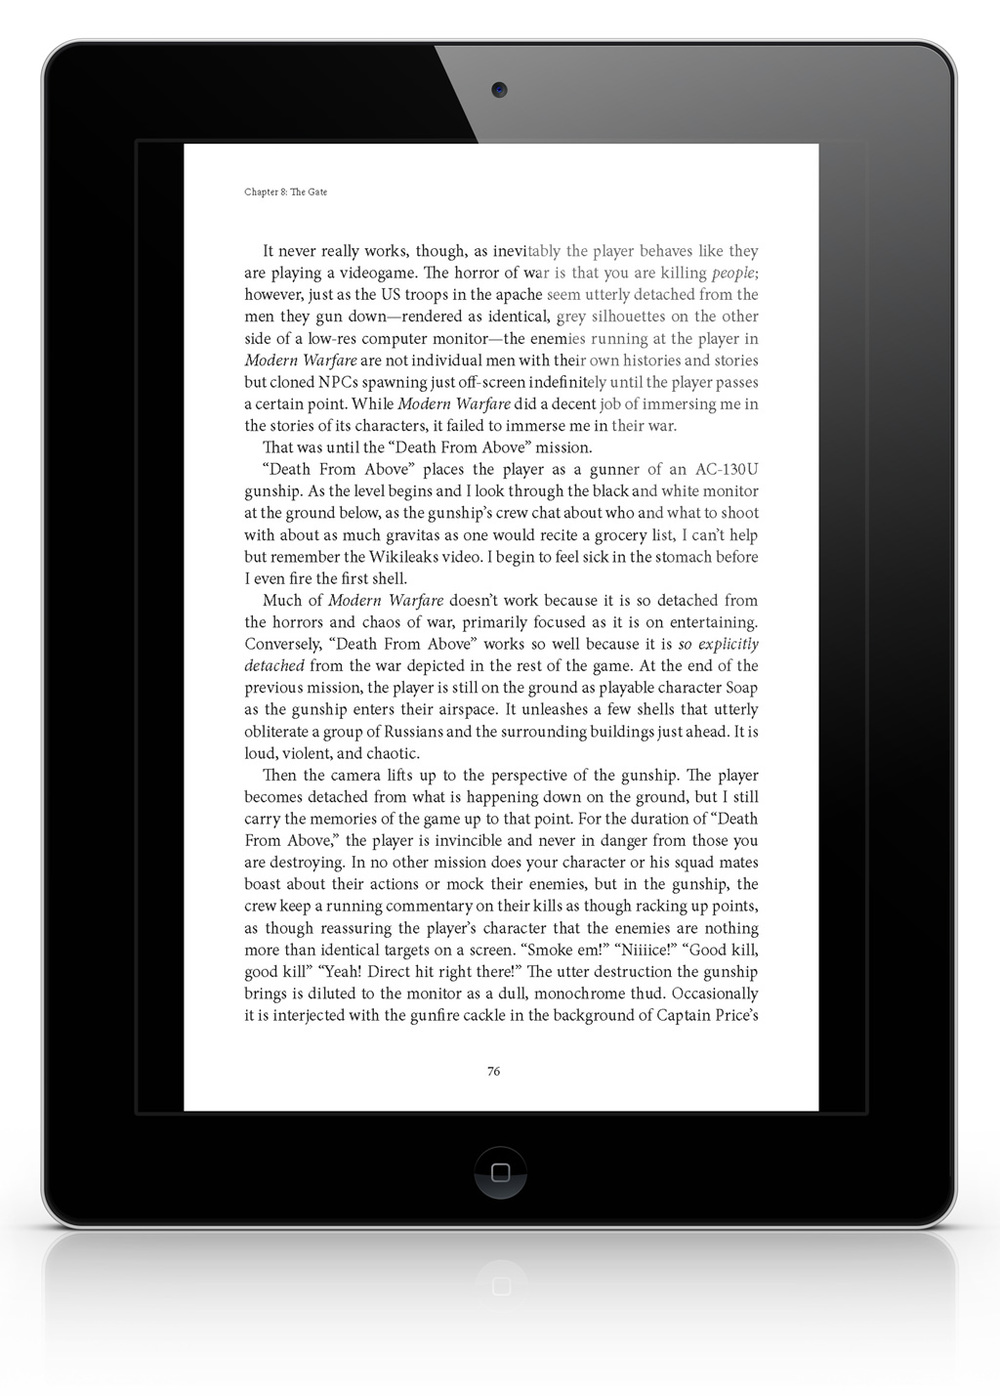 iPad-Retina-Display-Mockup3.jpg